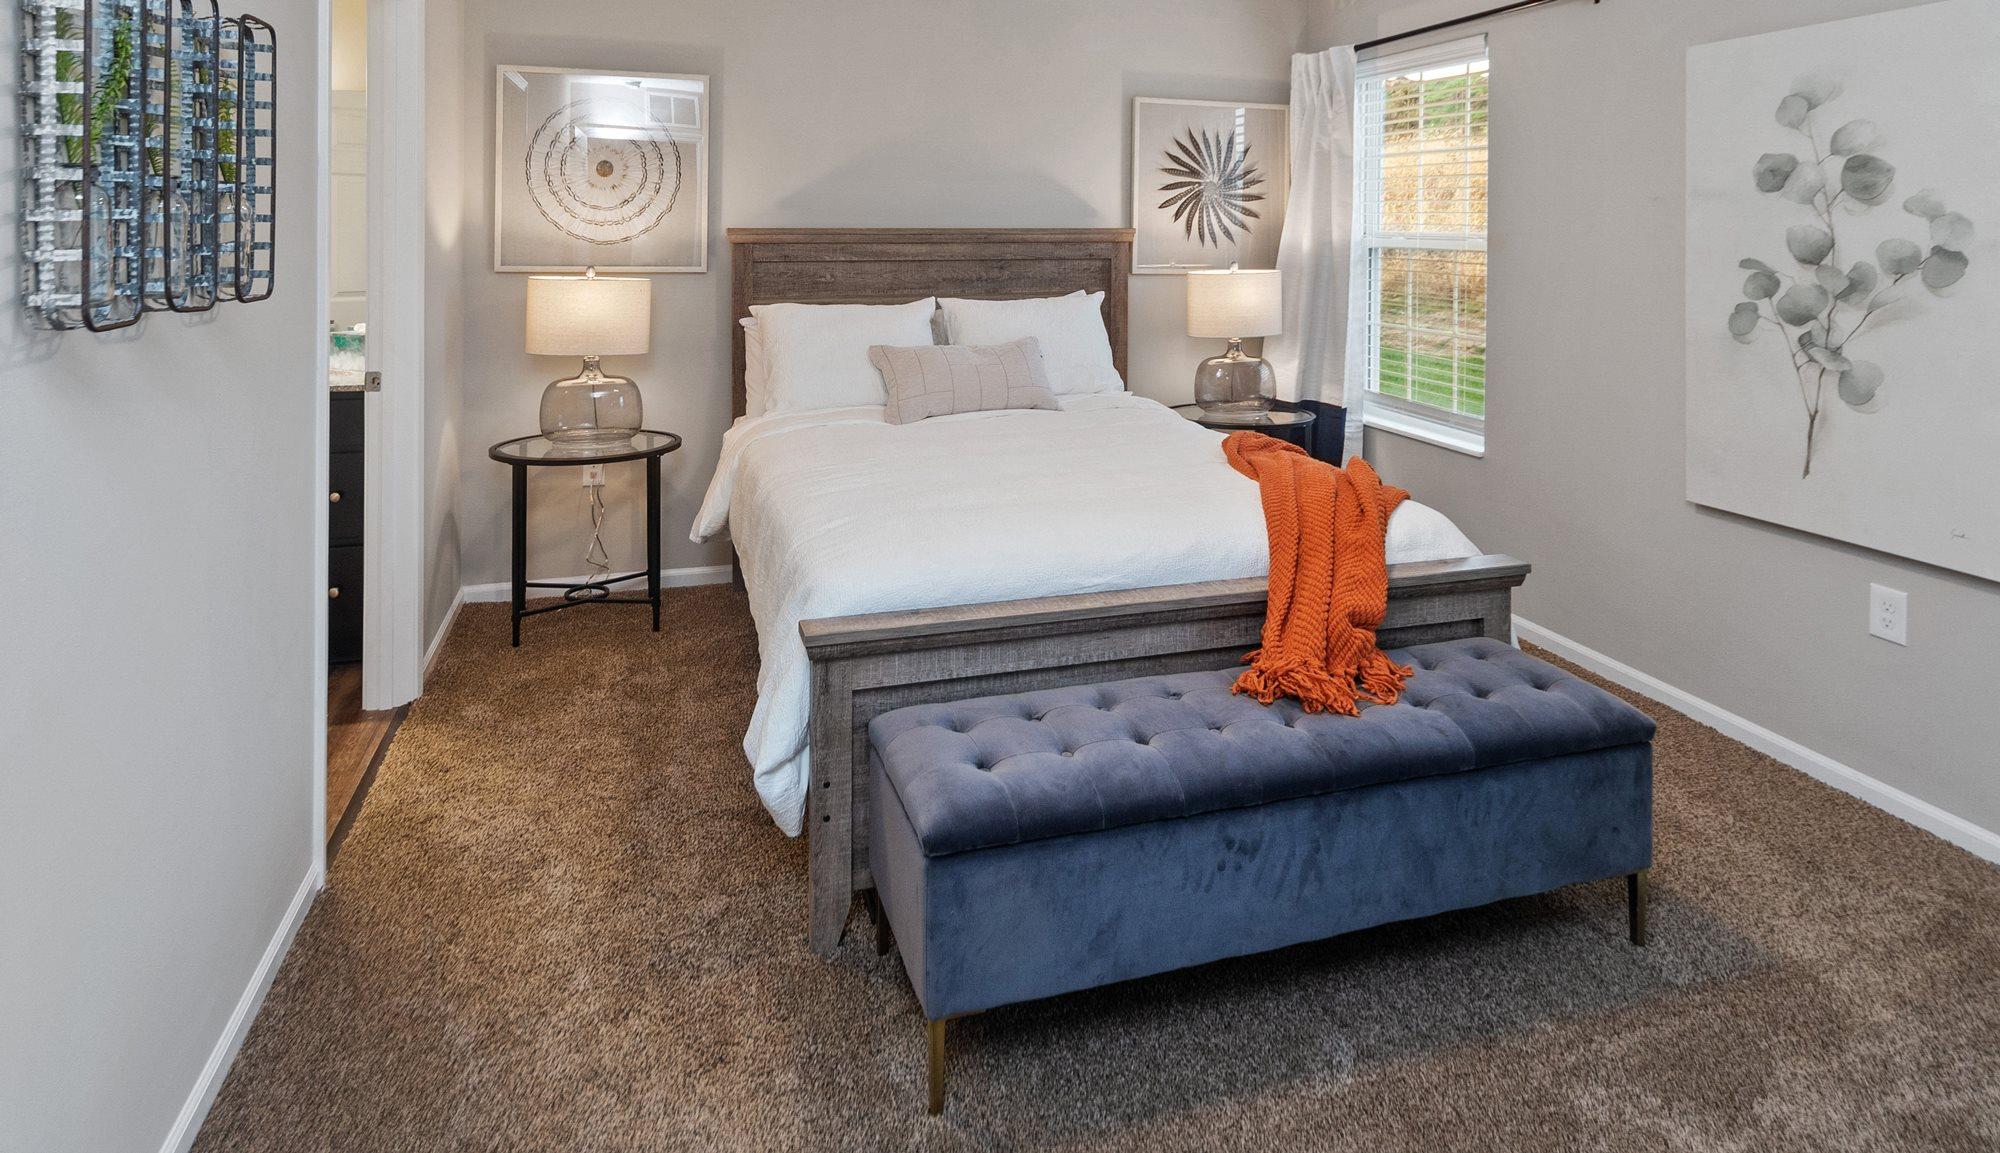 Brownstown MI apartment rentals Redwood Brownstown Telegraph Road bedroom